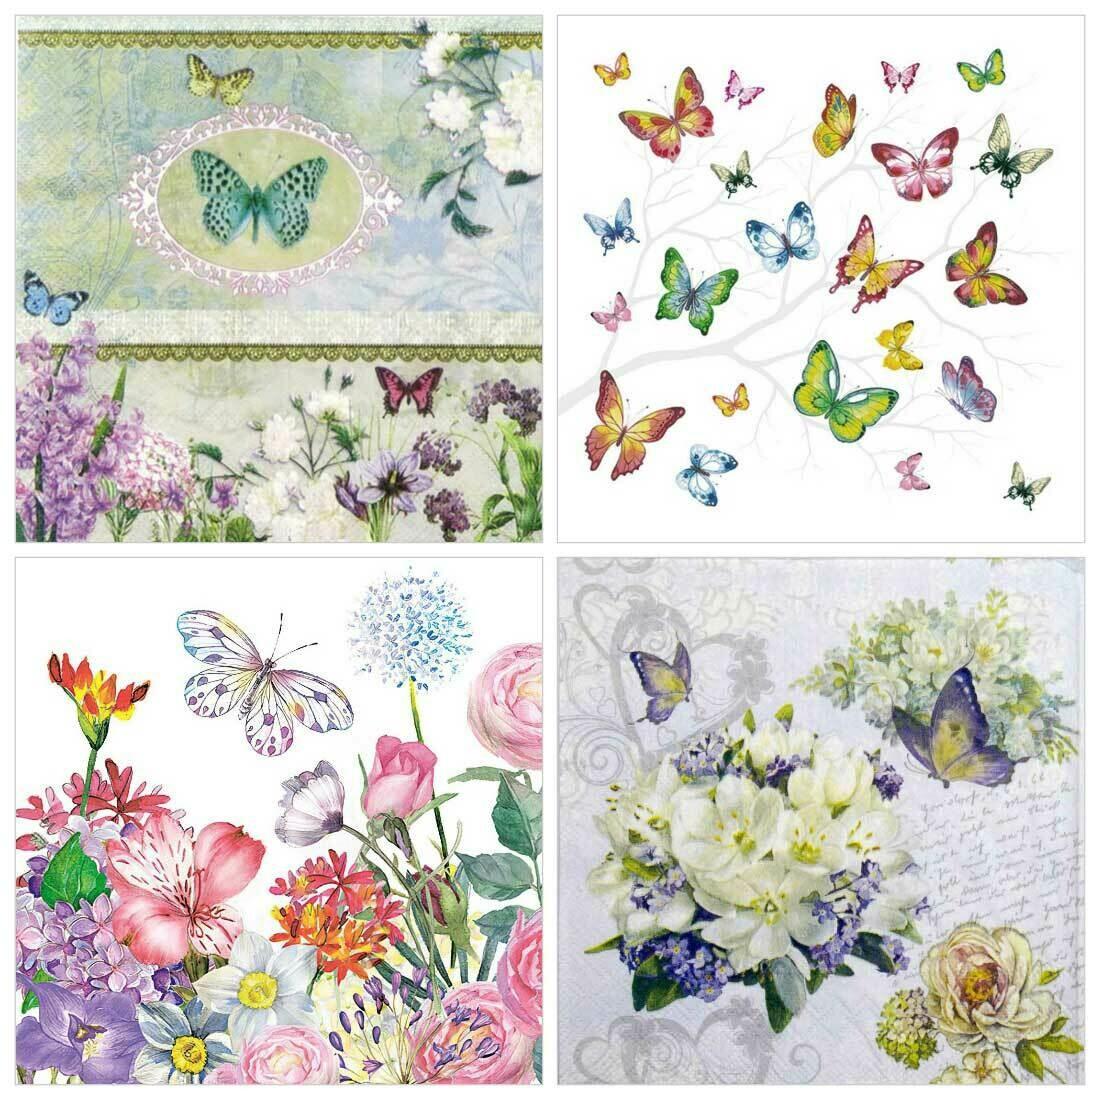 Decoupage Paper Napkins - Butterflies 5 (4 Sheets)